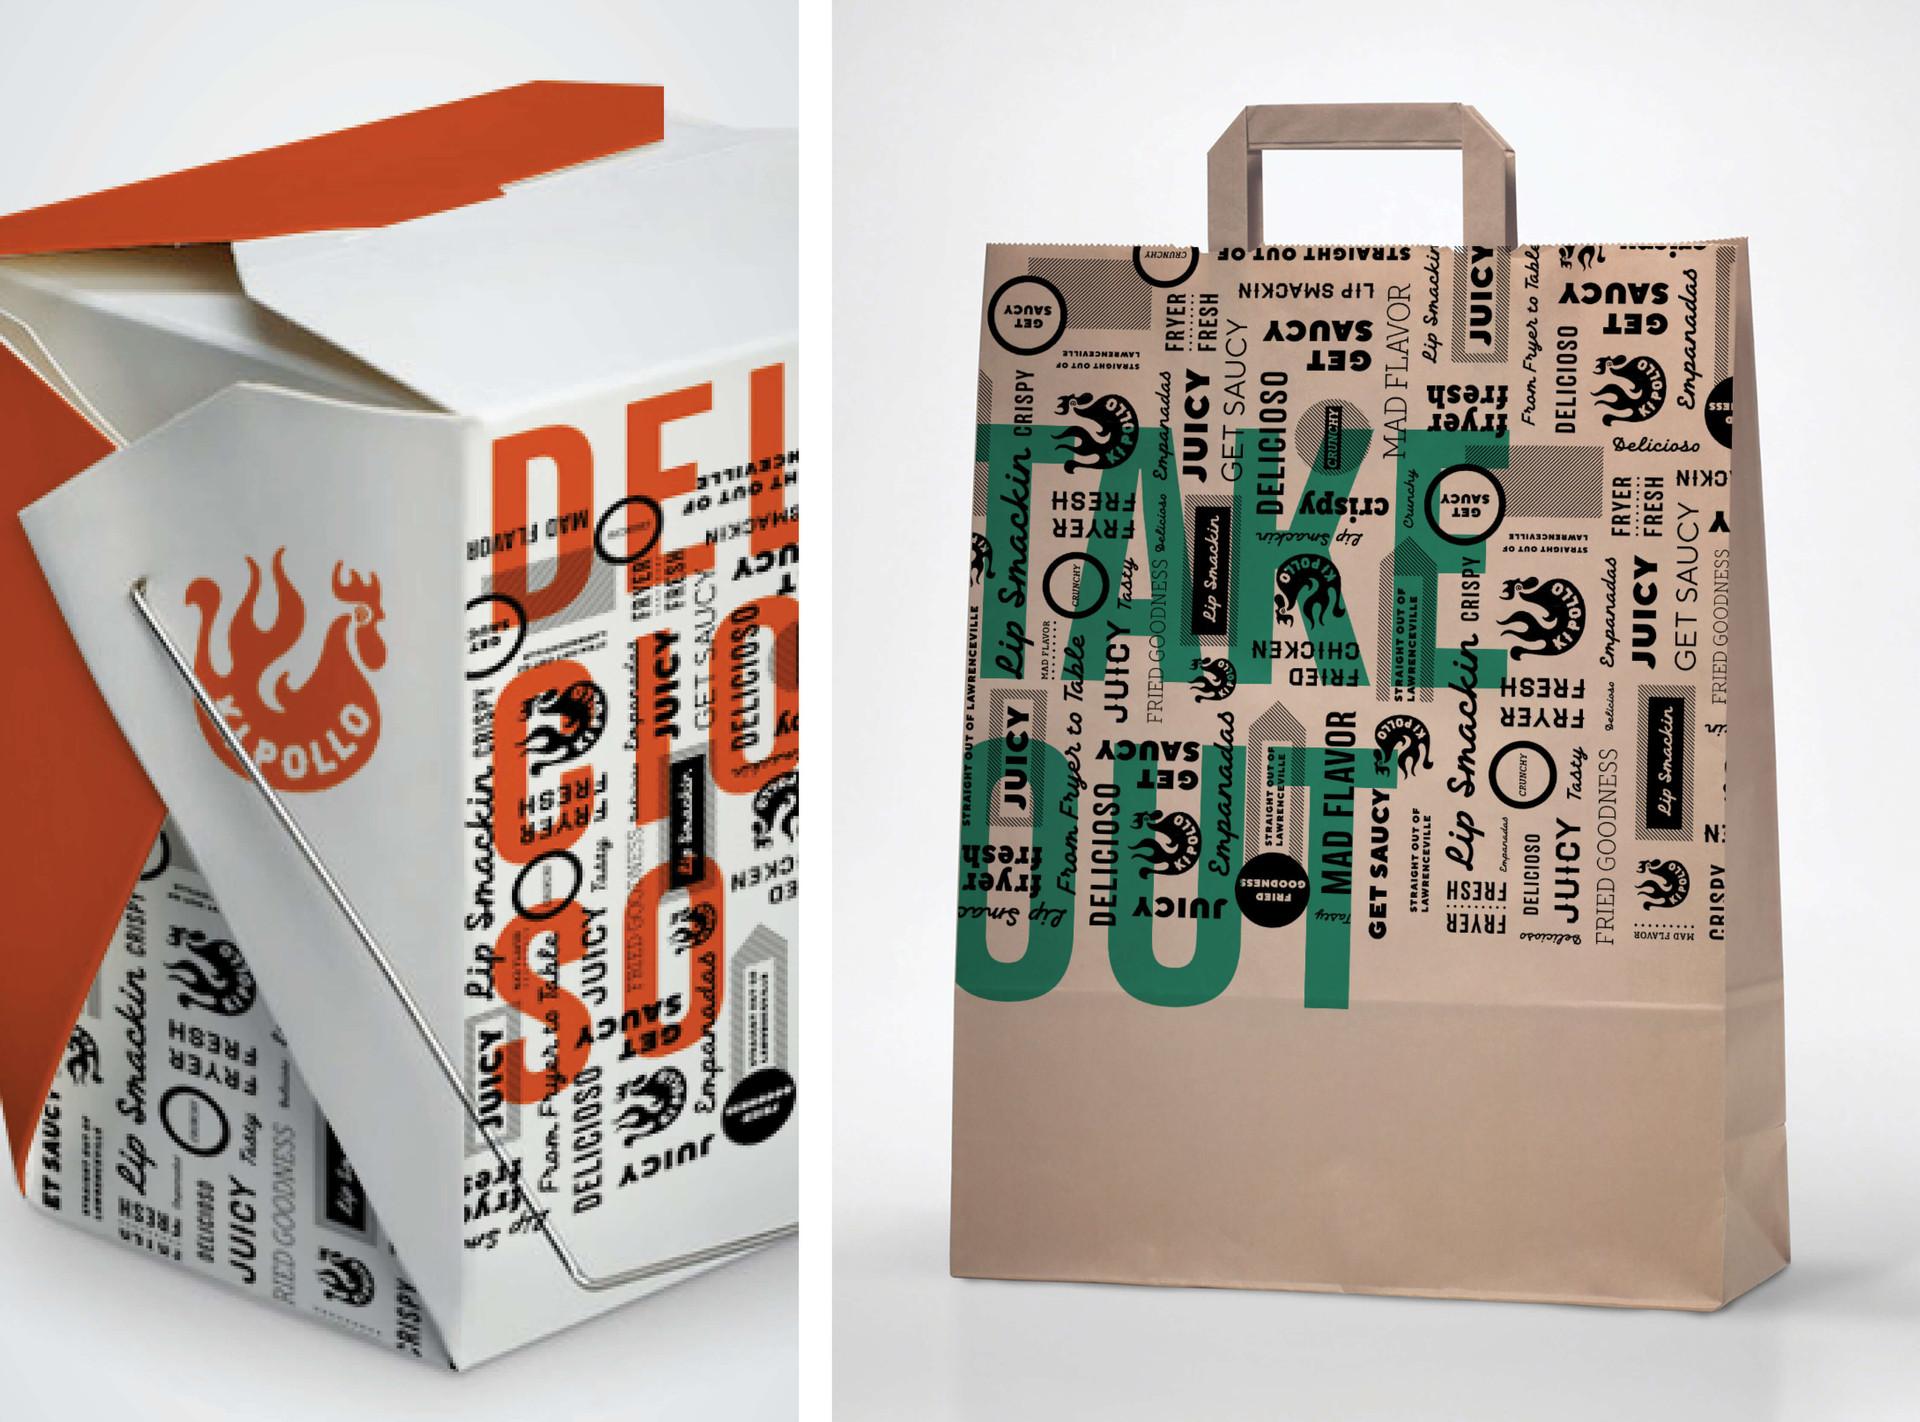 Ki Pollo Packaging Design